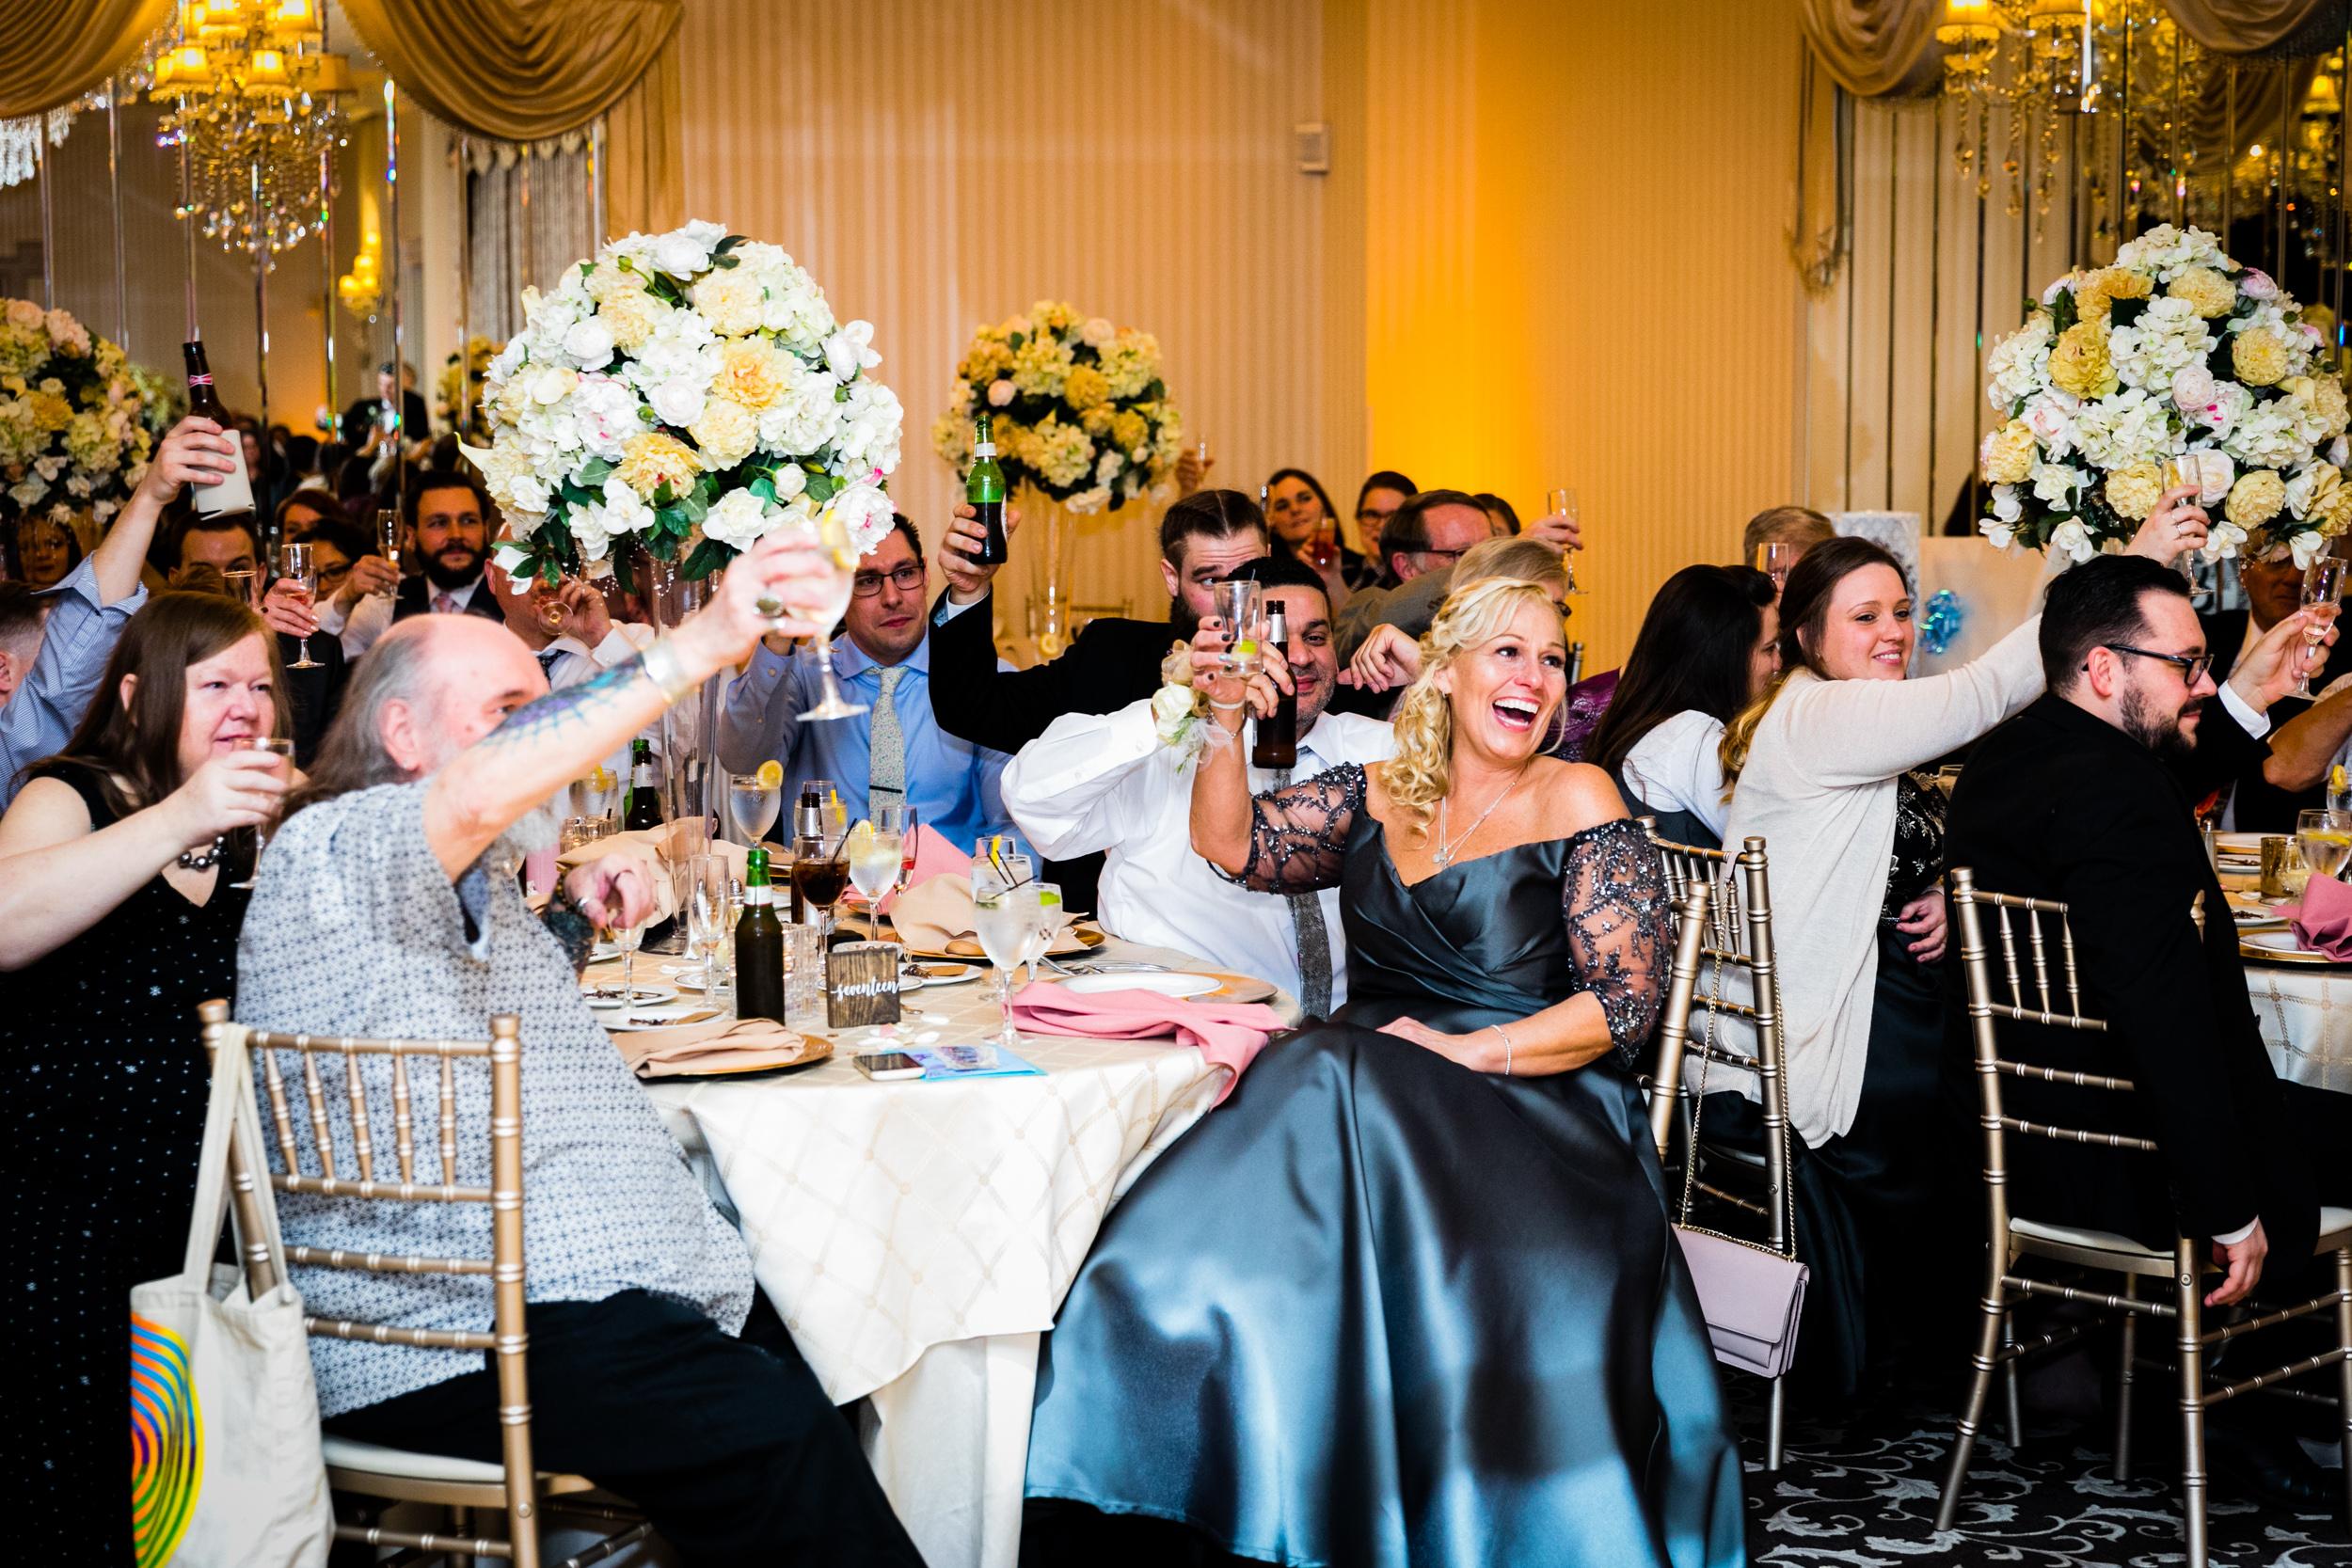 CELEBRATIONS BENSALEM WEDDING PHOTOGRAPHY-87.jpg